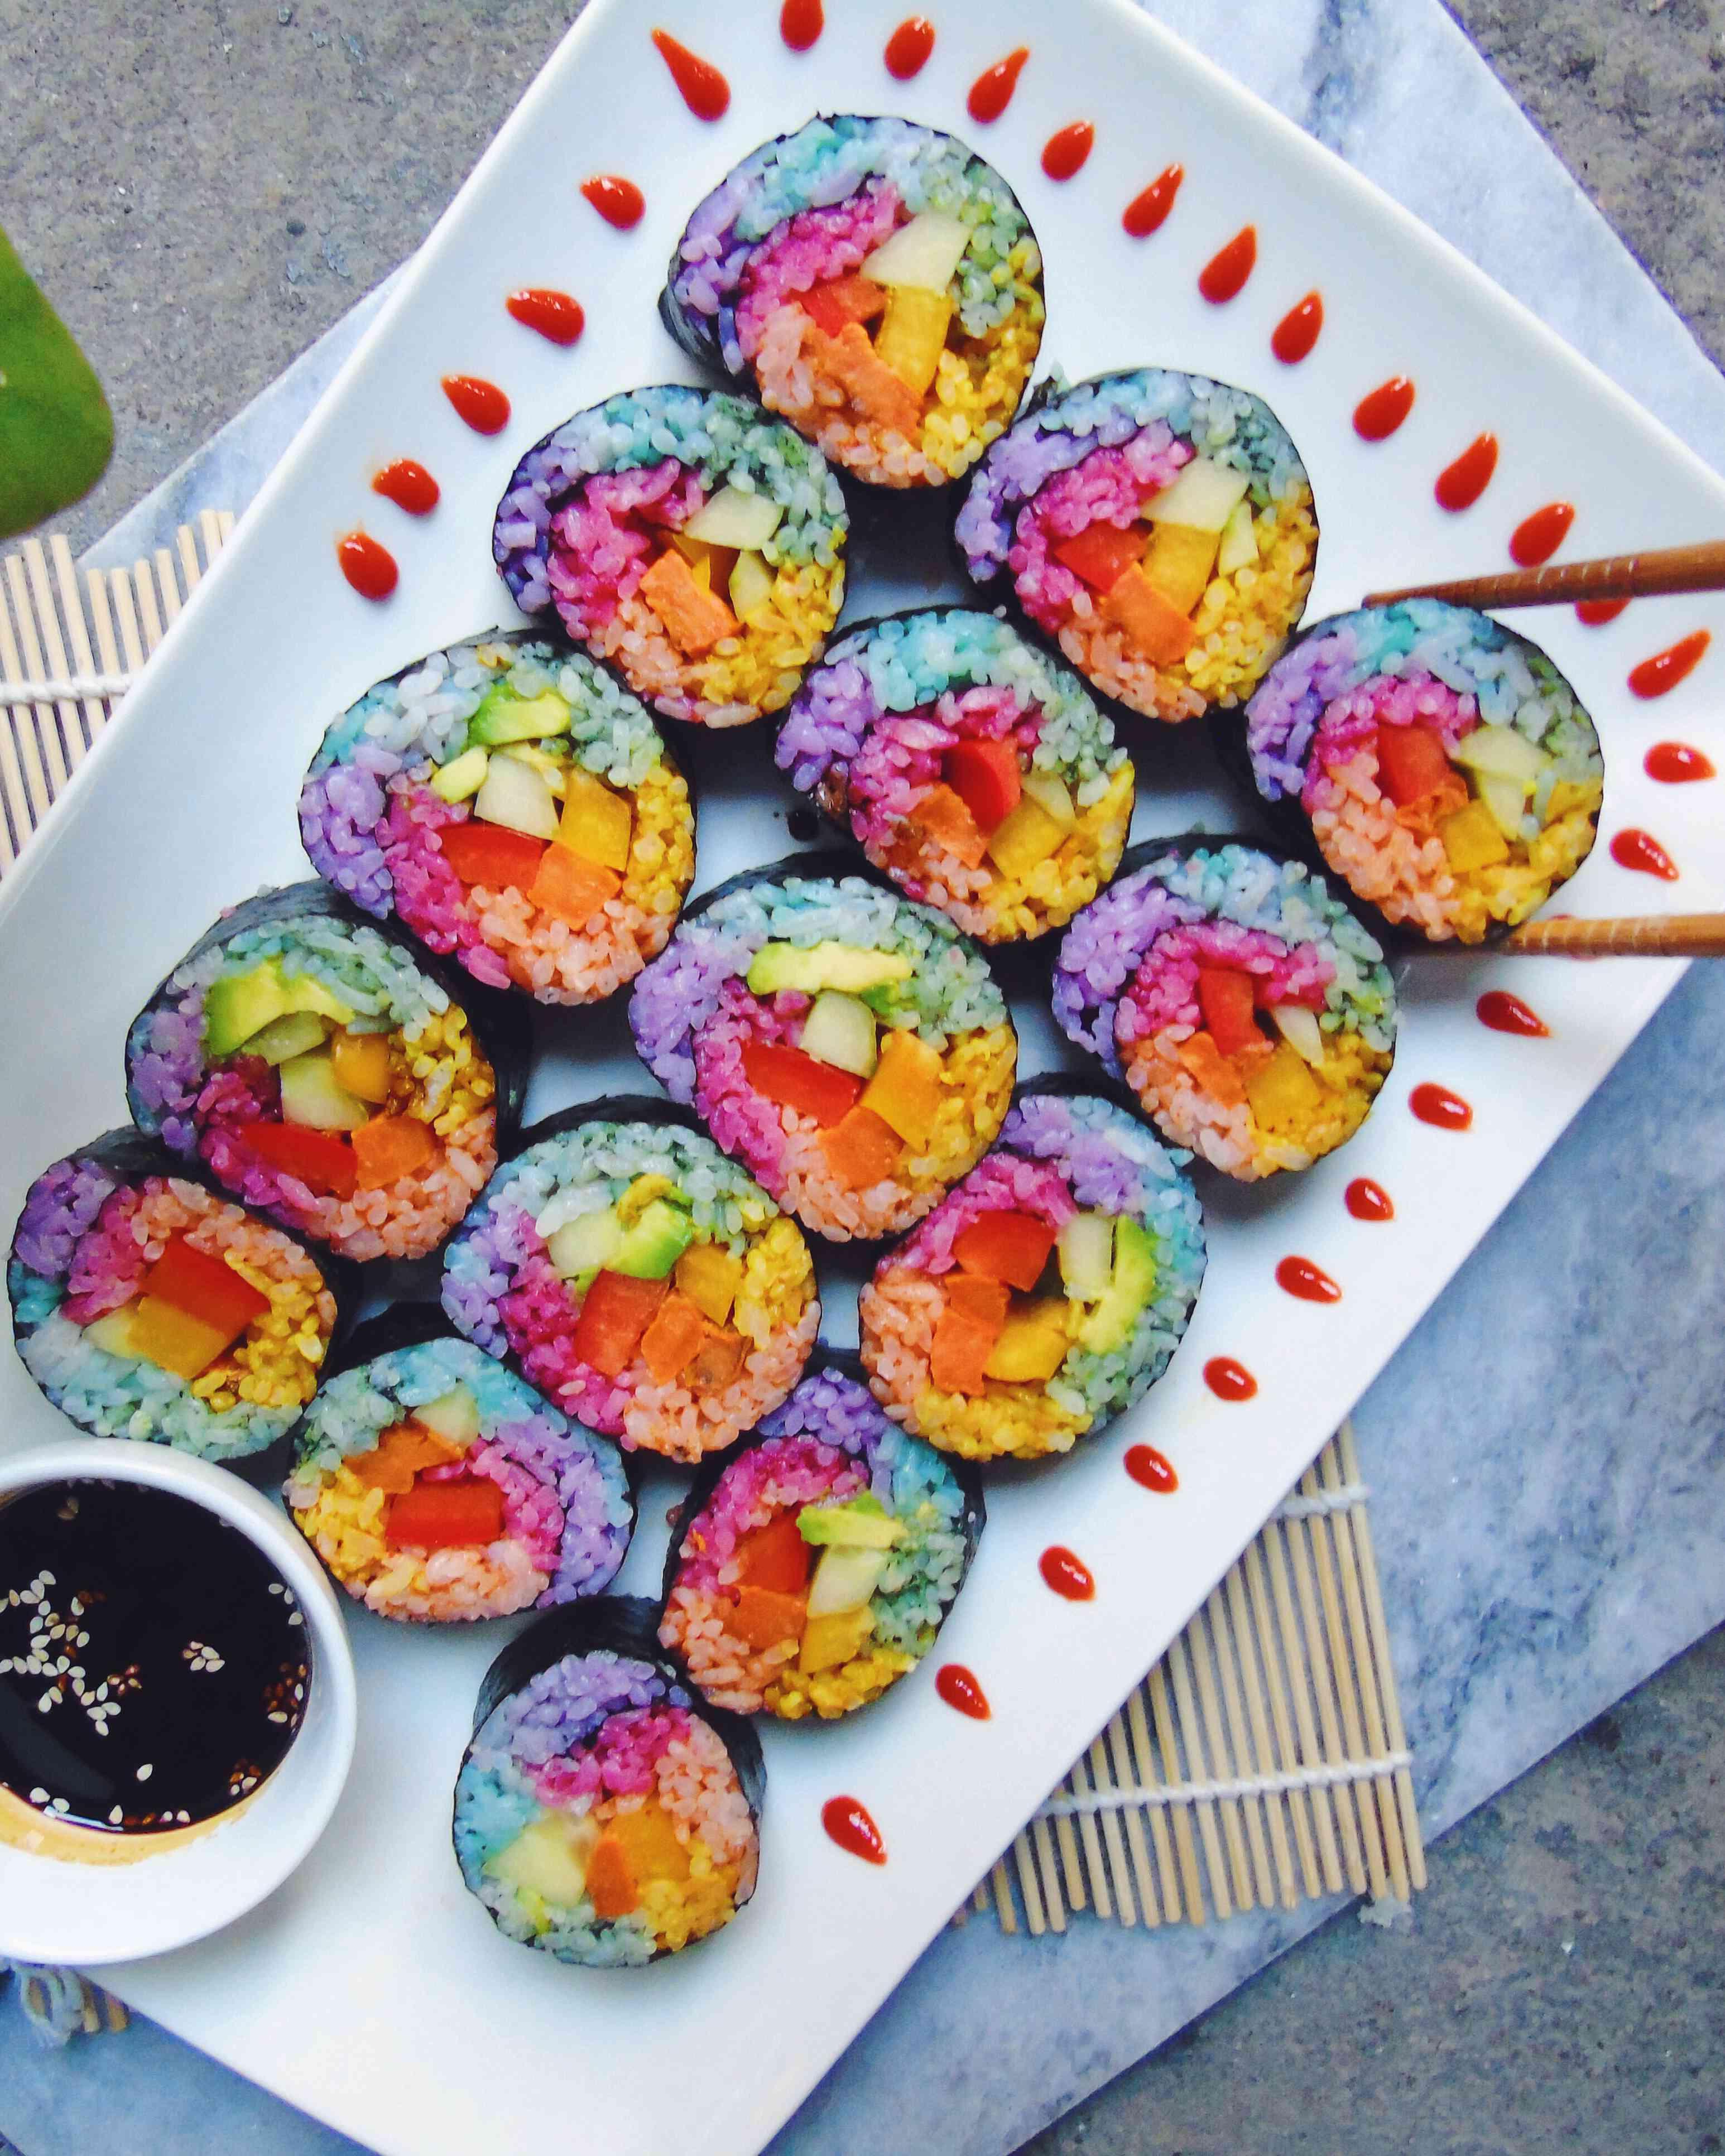 Unicorn Recipes | Unicorn Food | Unicorn Birthday Party | The Geeks have gathered 10 unicorn themed recipes for National Unicorn Day! 2geekswhoeat.com